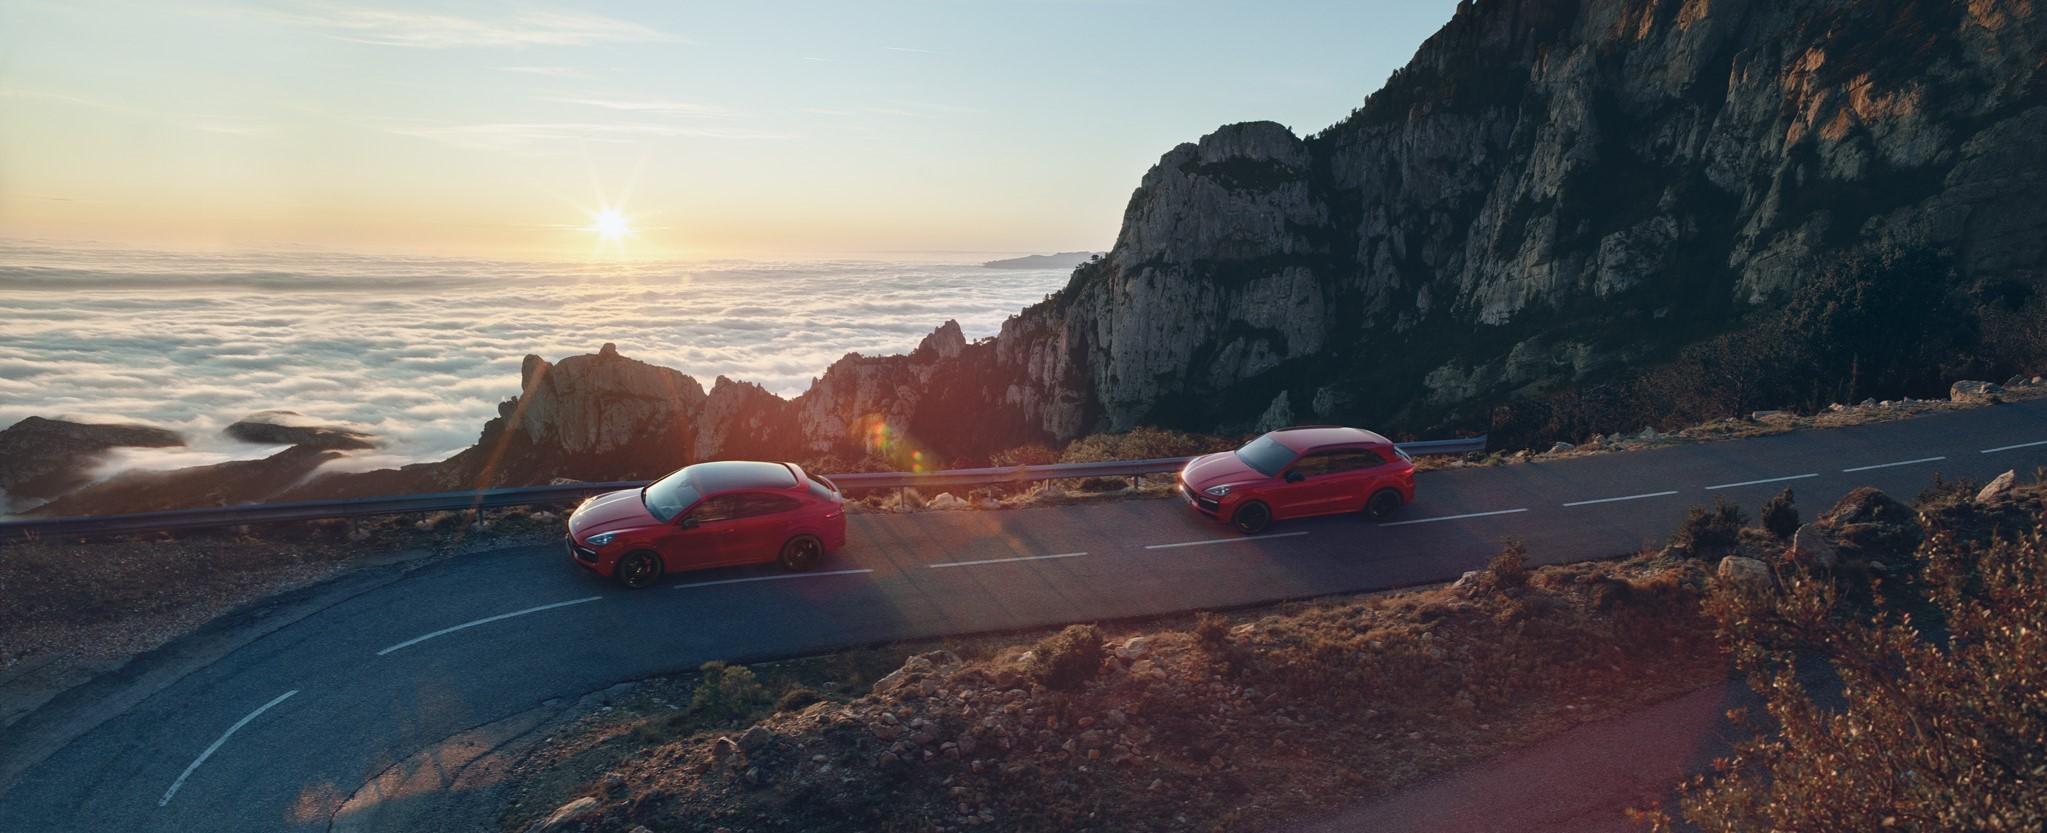 I nuovi modelli Cayenne GTS